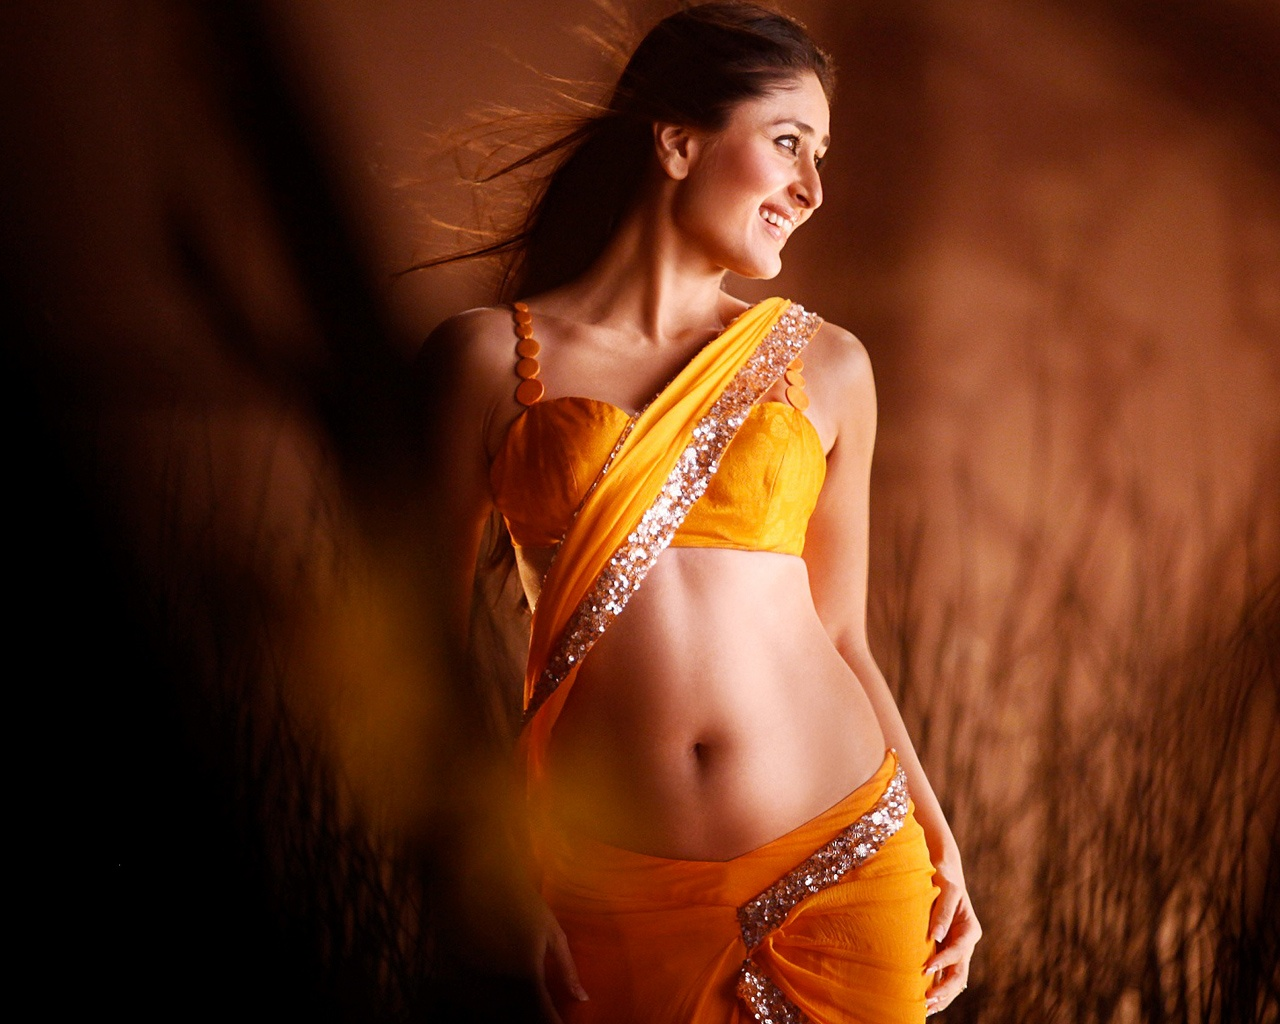 kareena kapoor 2012 movie wallpapers in jpg format for free download